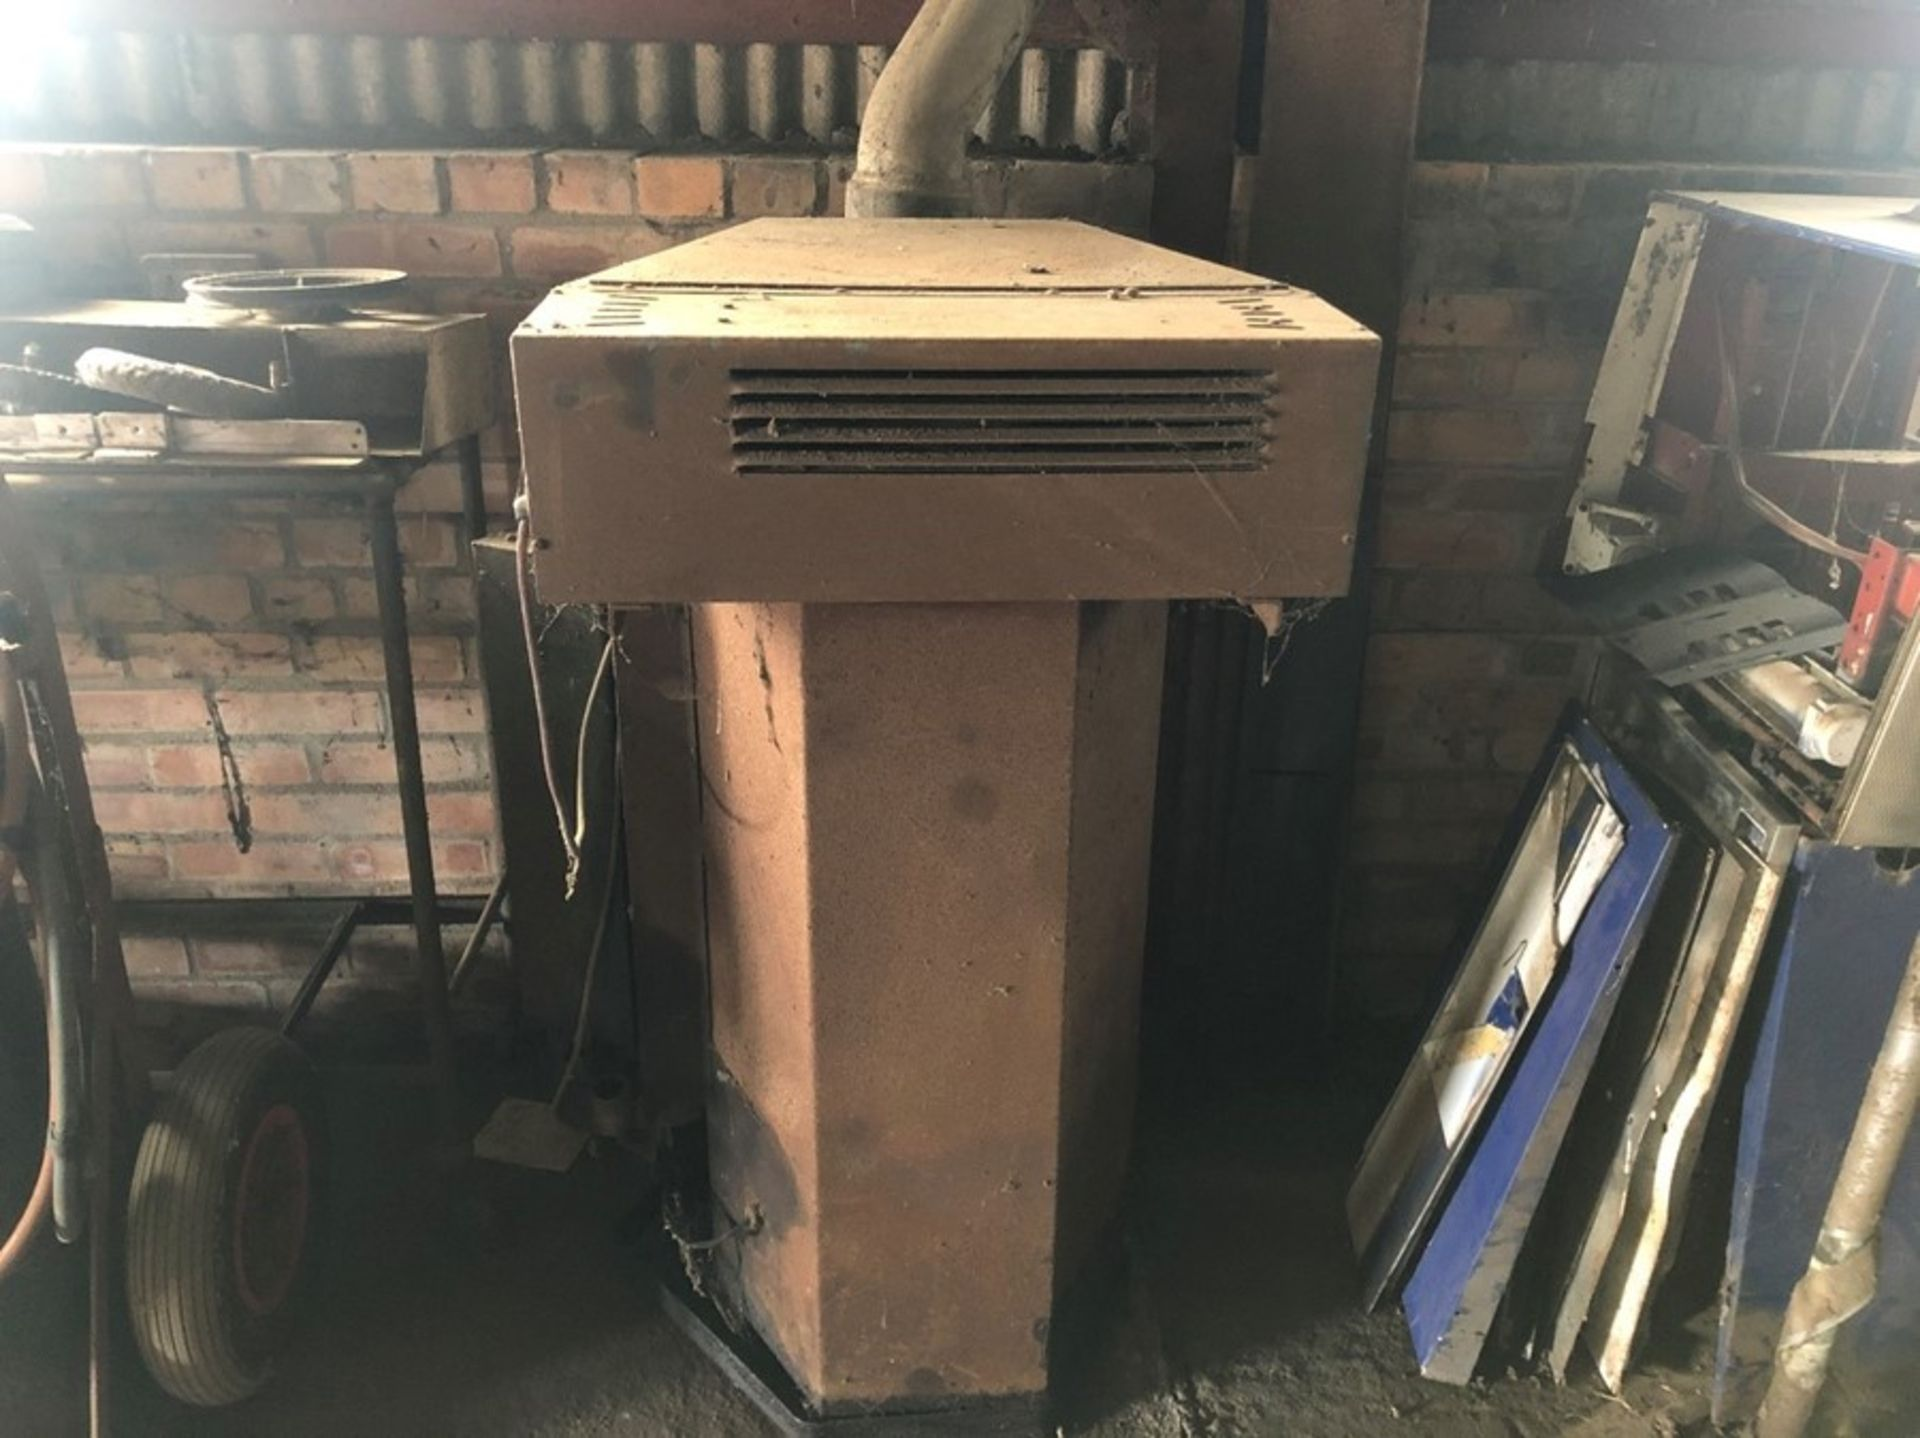 Workshop heater - Failed PAT test